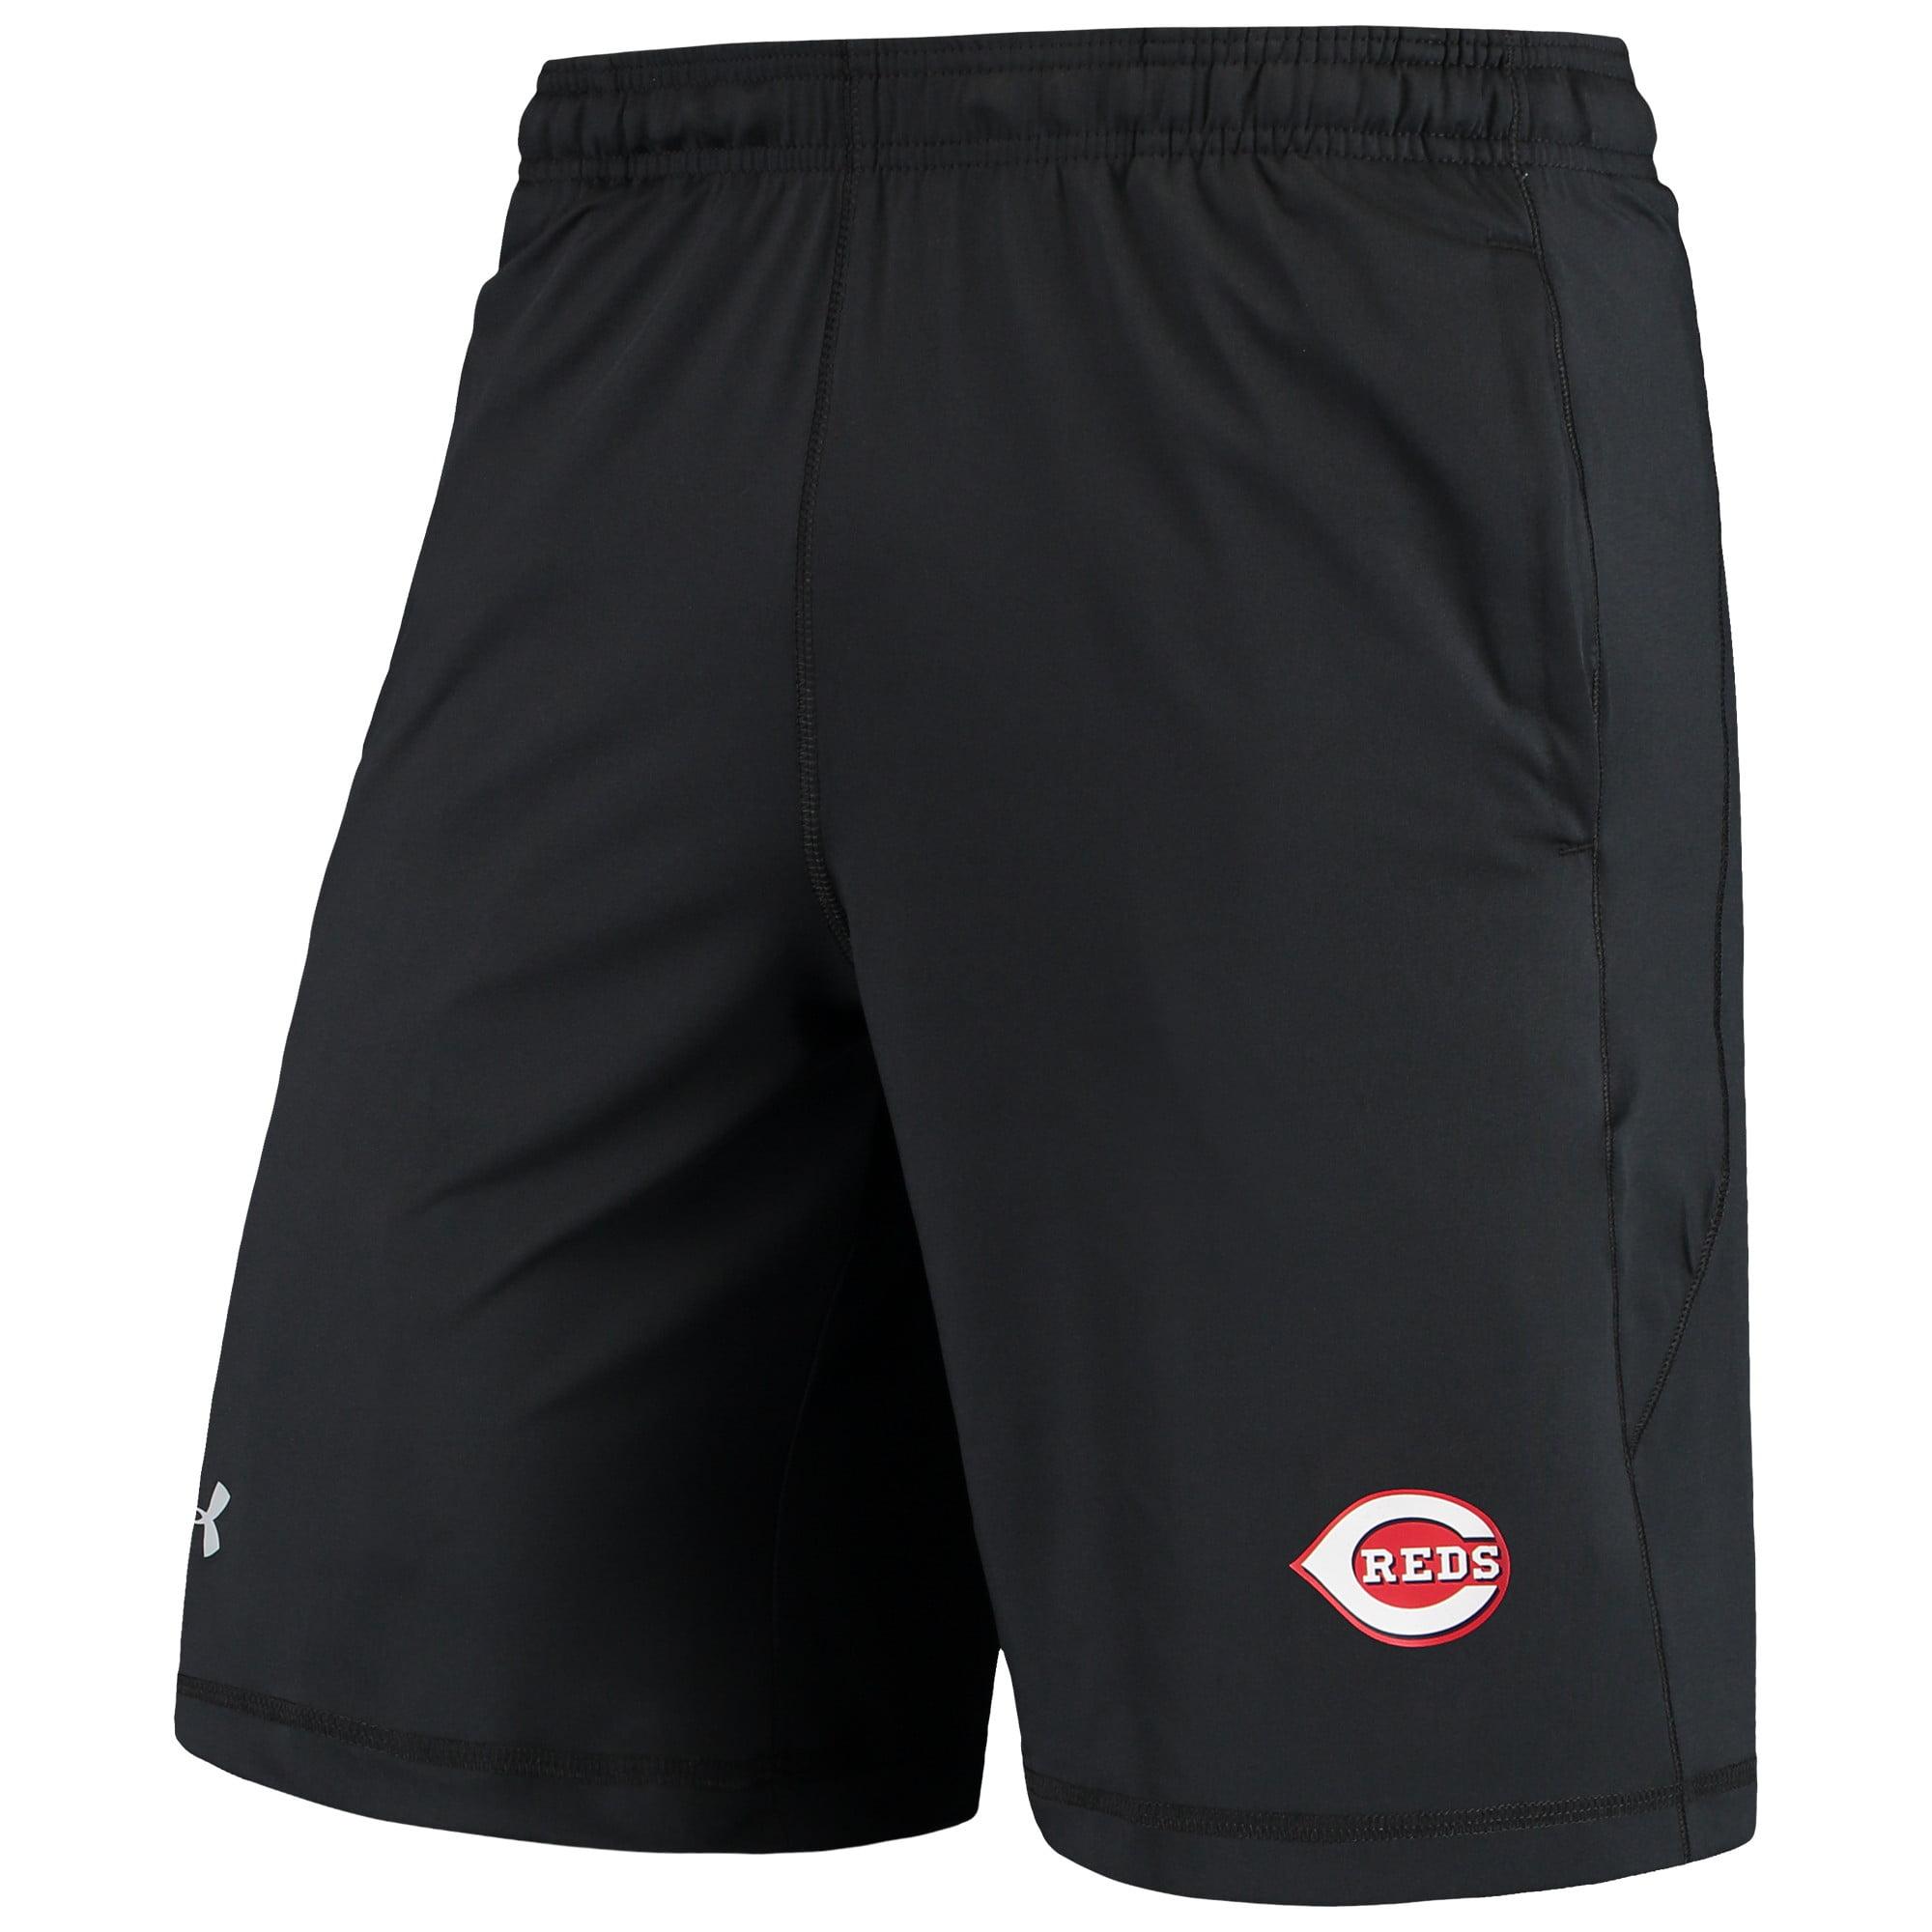 Cincinnati Reds Under Armour Raid Left Leg Performance Shorts - Black